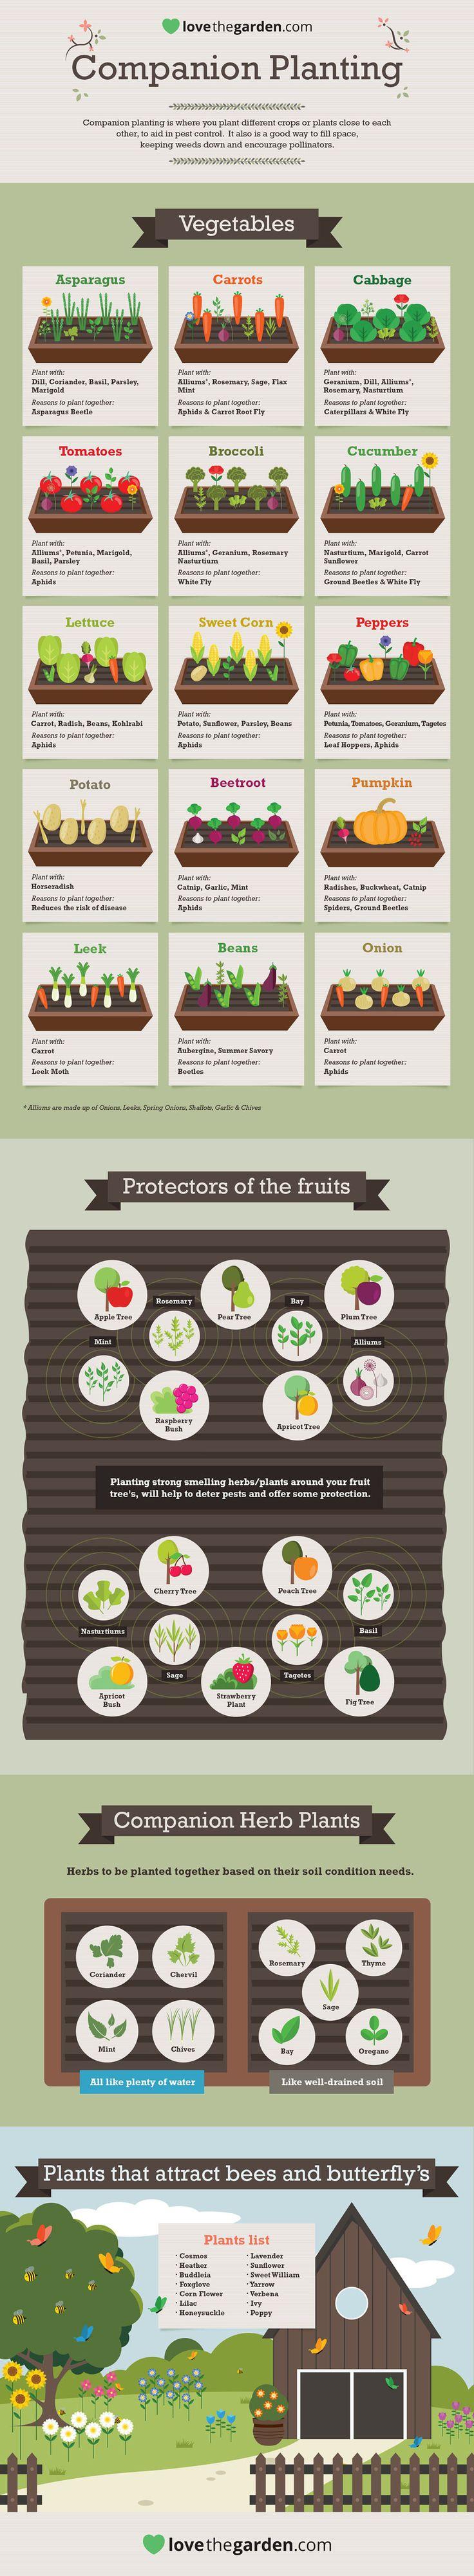 Companion planting infographic